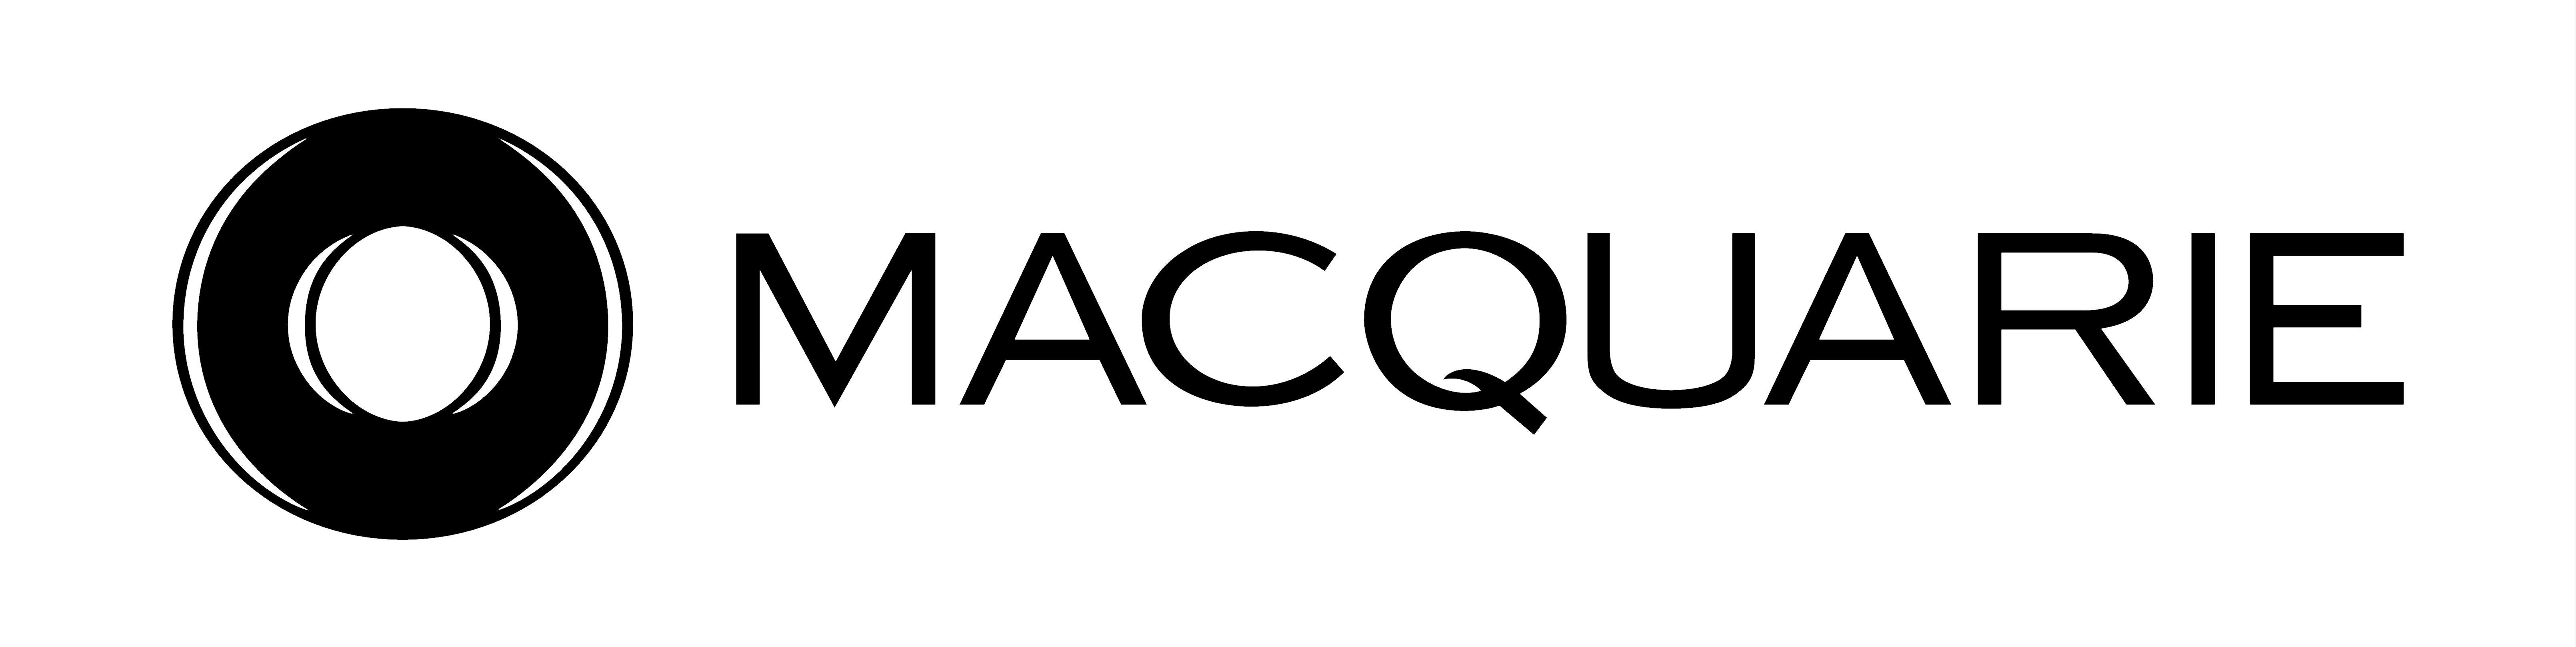 Macquarie logo - Macquarie Logo Vector PNG - Amideas Logo Vector PNG